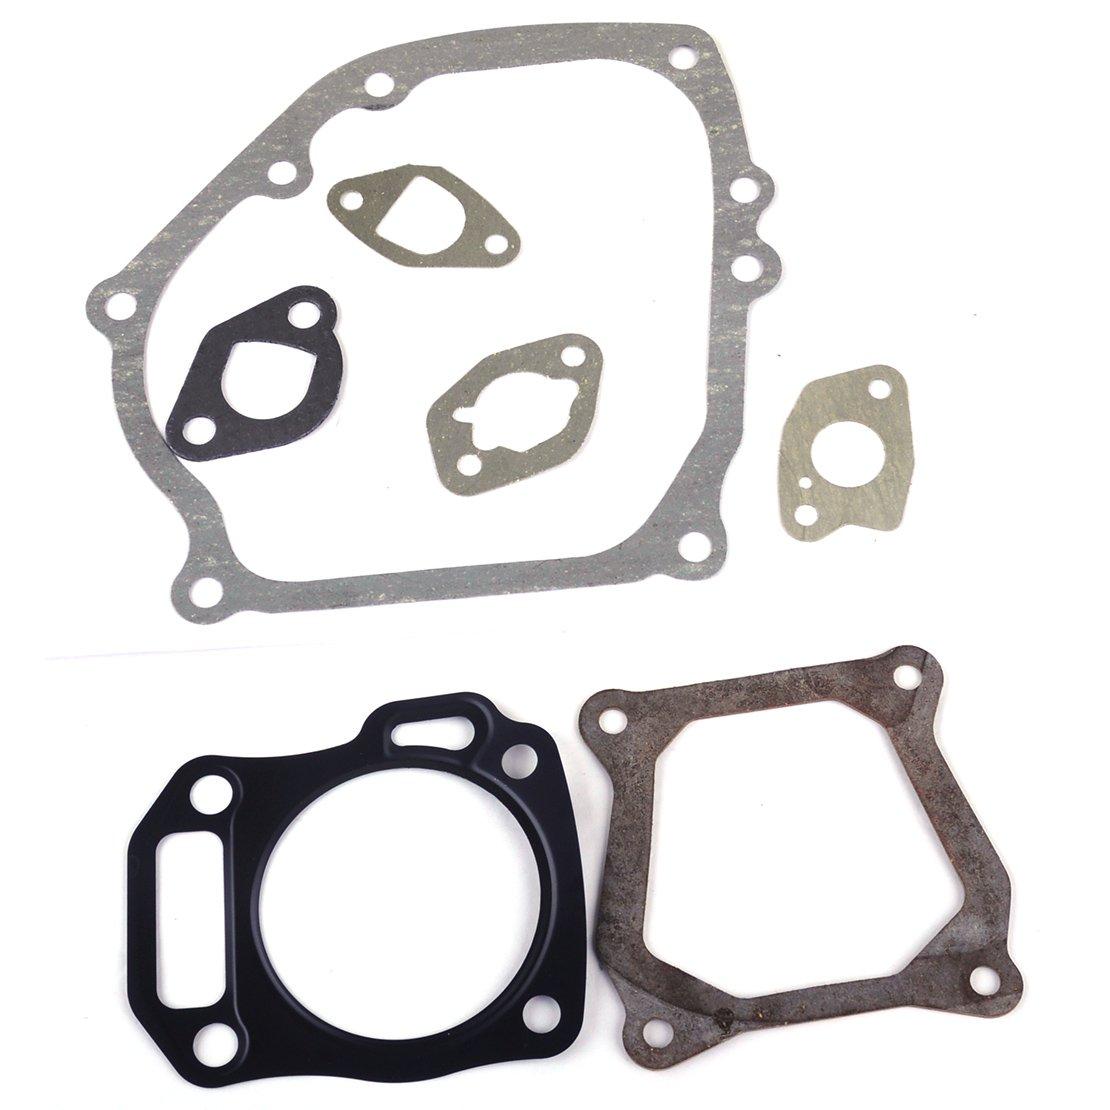 Gasket Kit fits for Honda GX160 5.5HP GX200 6.5HP China 168F 168FA 168FB Engine